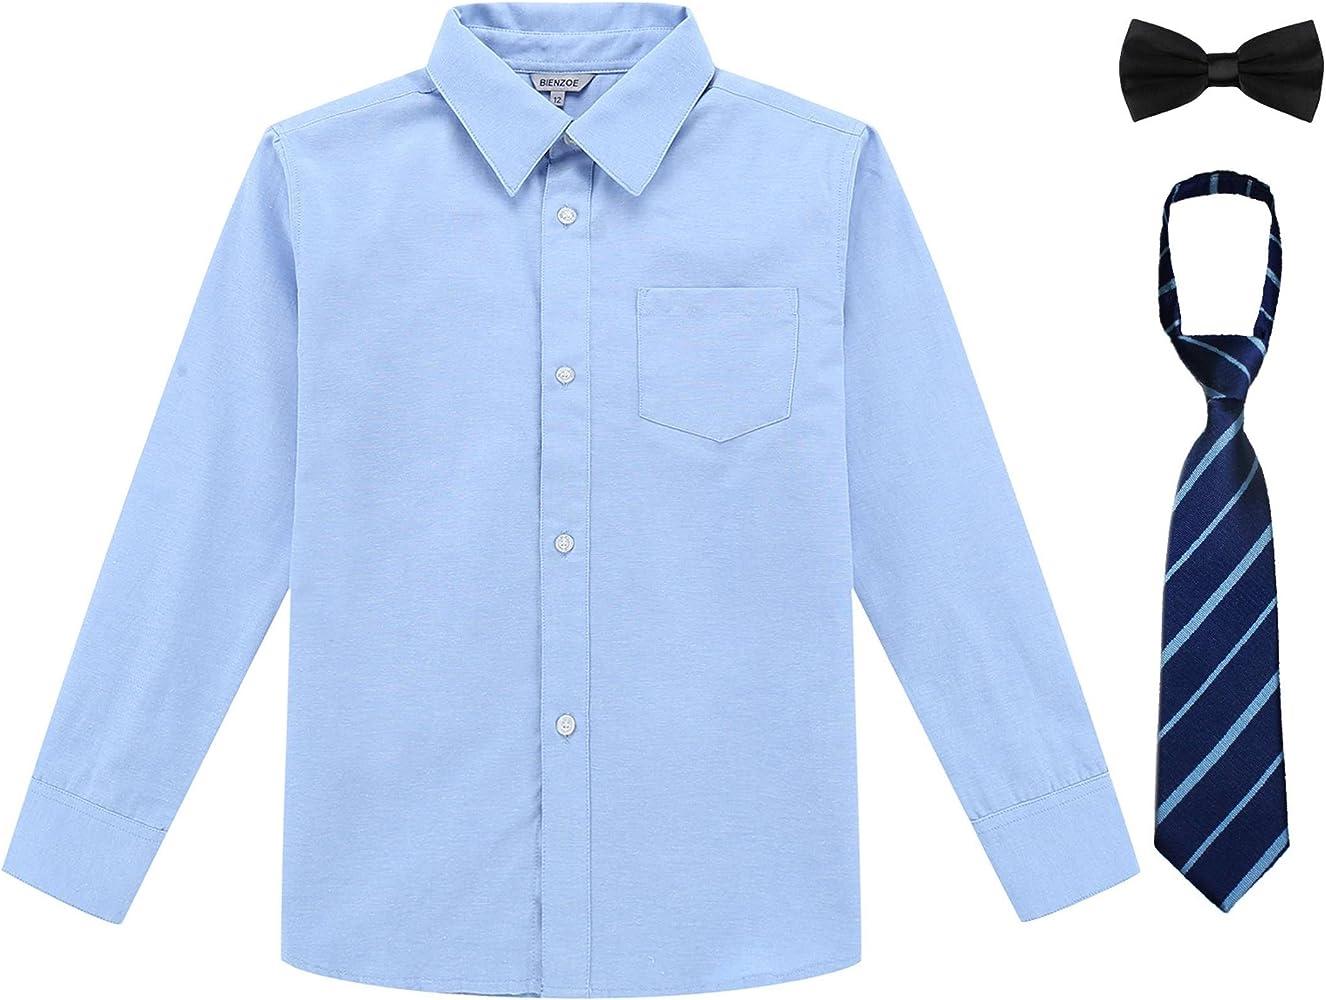 44ad51332c3c Bienzoe Boy's School Uniform Long Sleeve Button Down Oxford Shirt Pack Blue  4